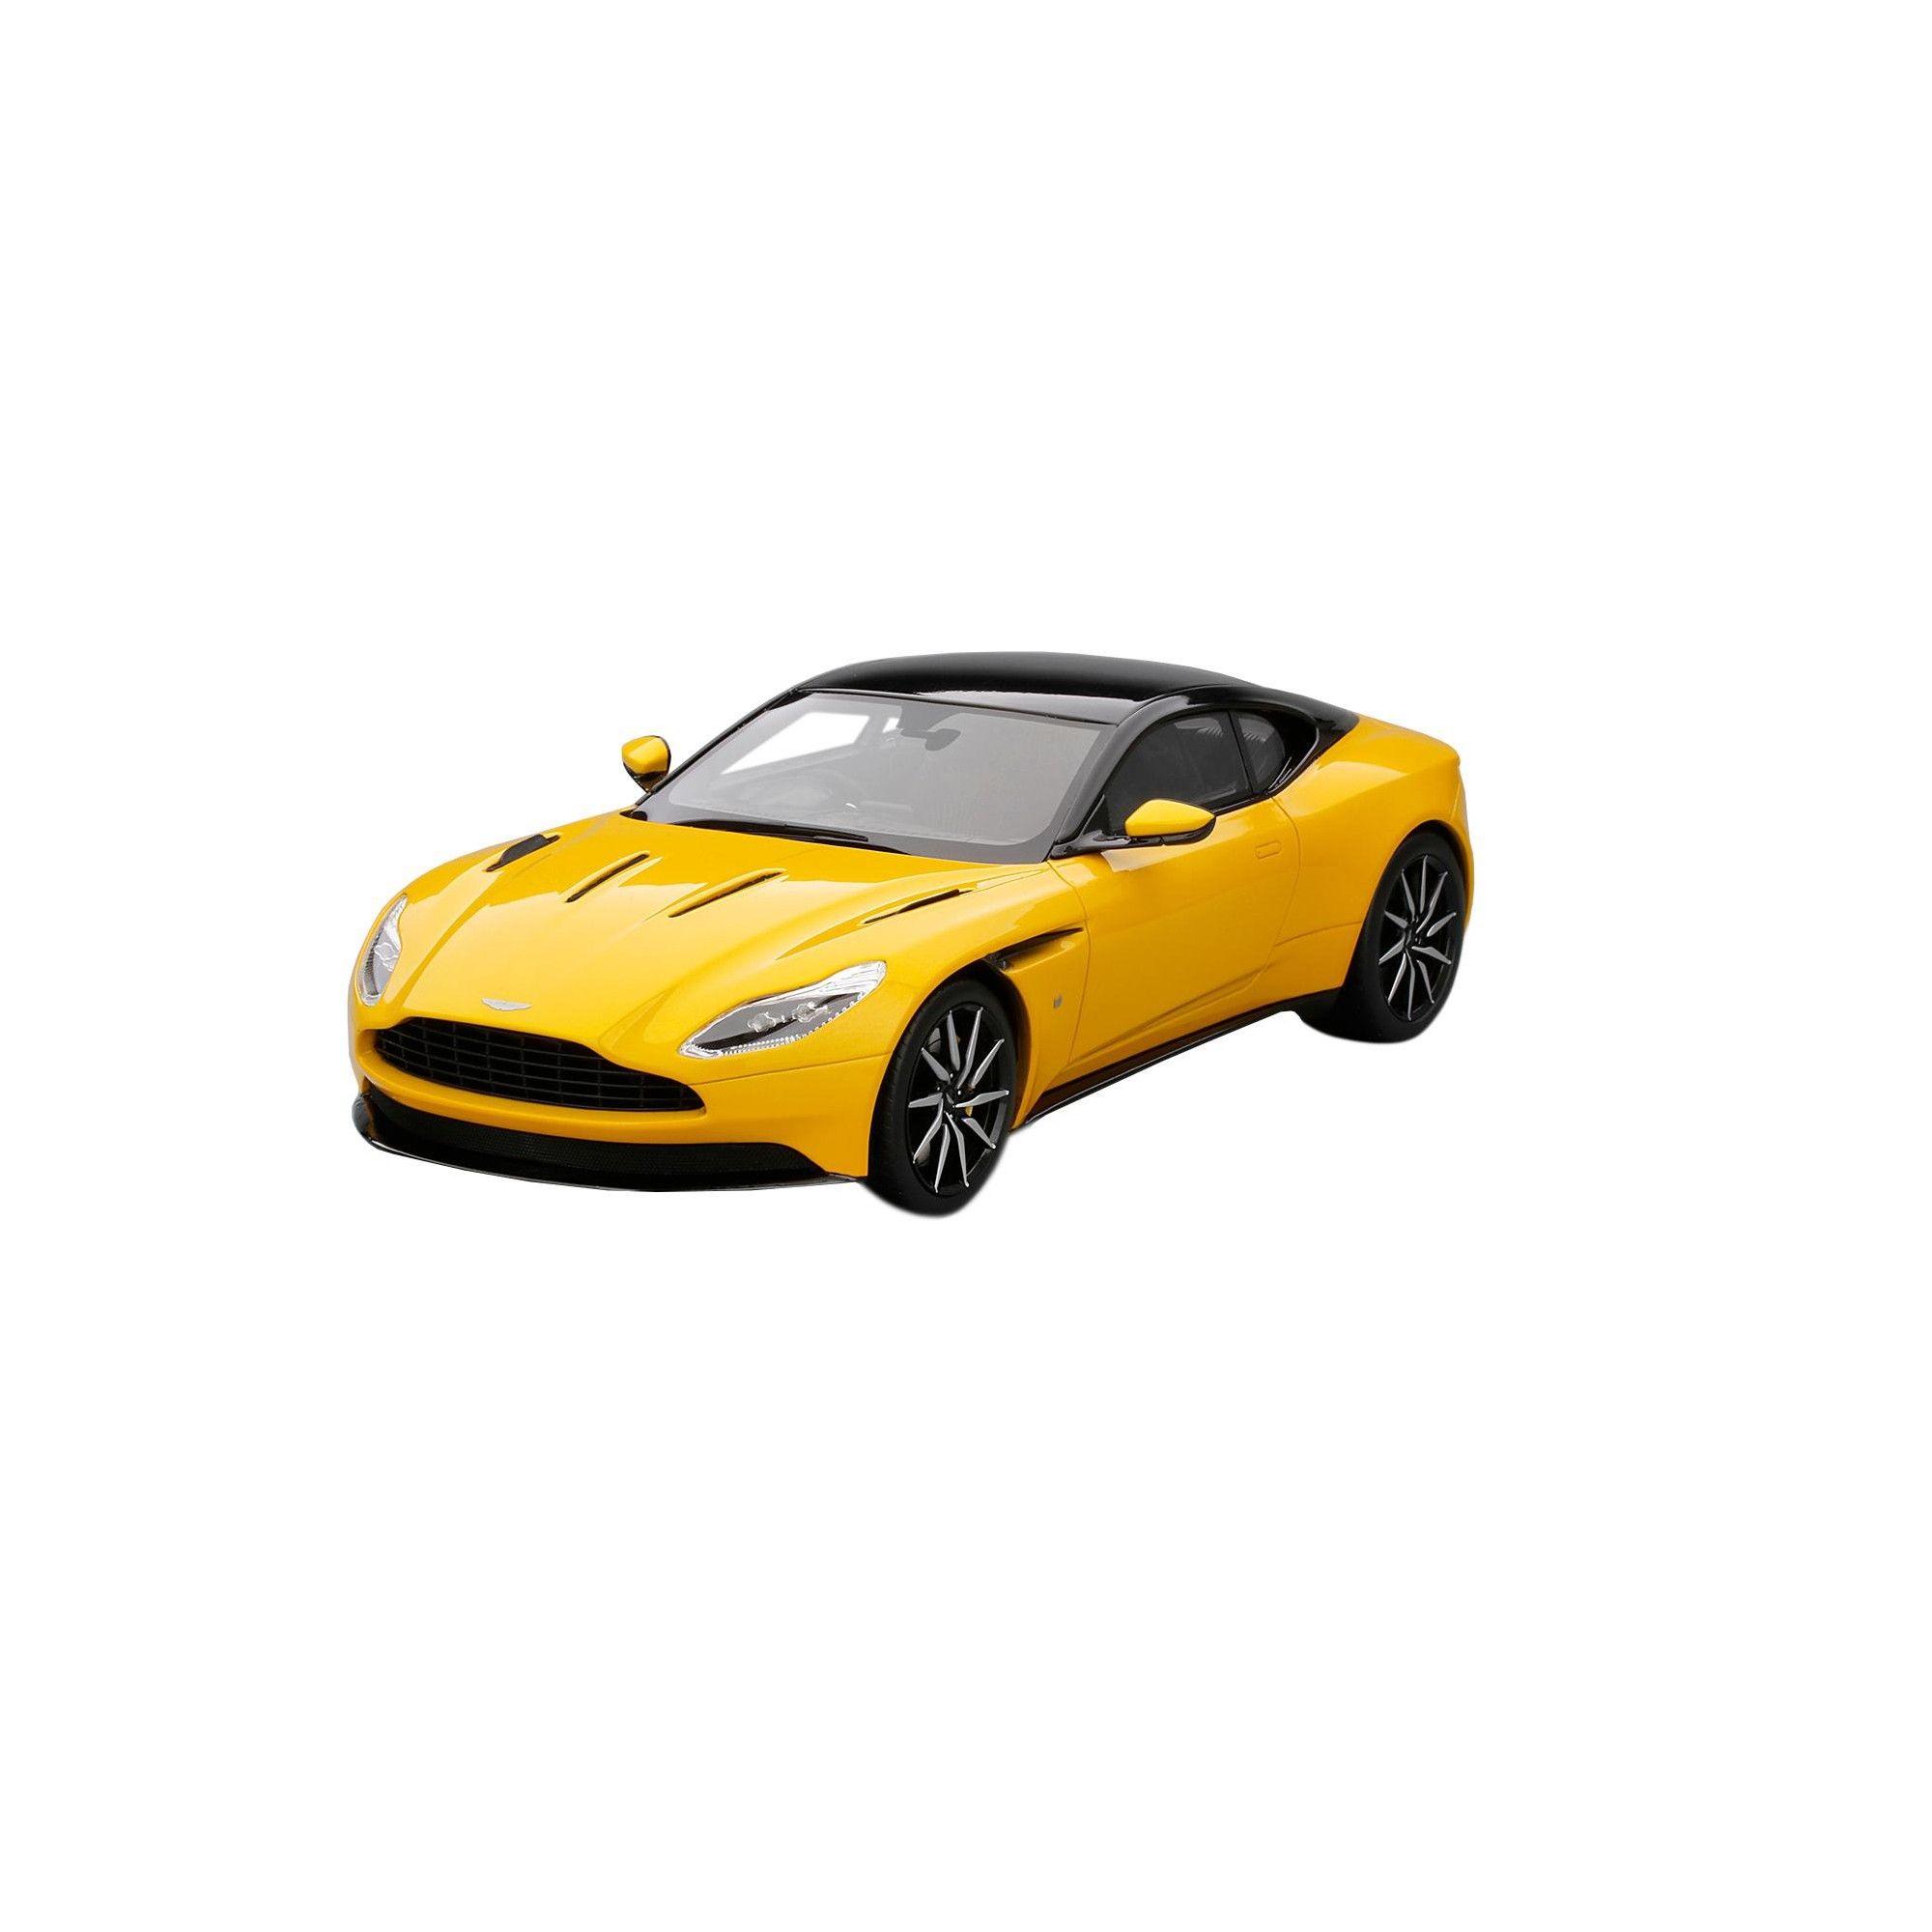 aston martin db11 sunburst yellow with black top limited edition to